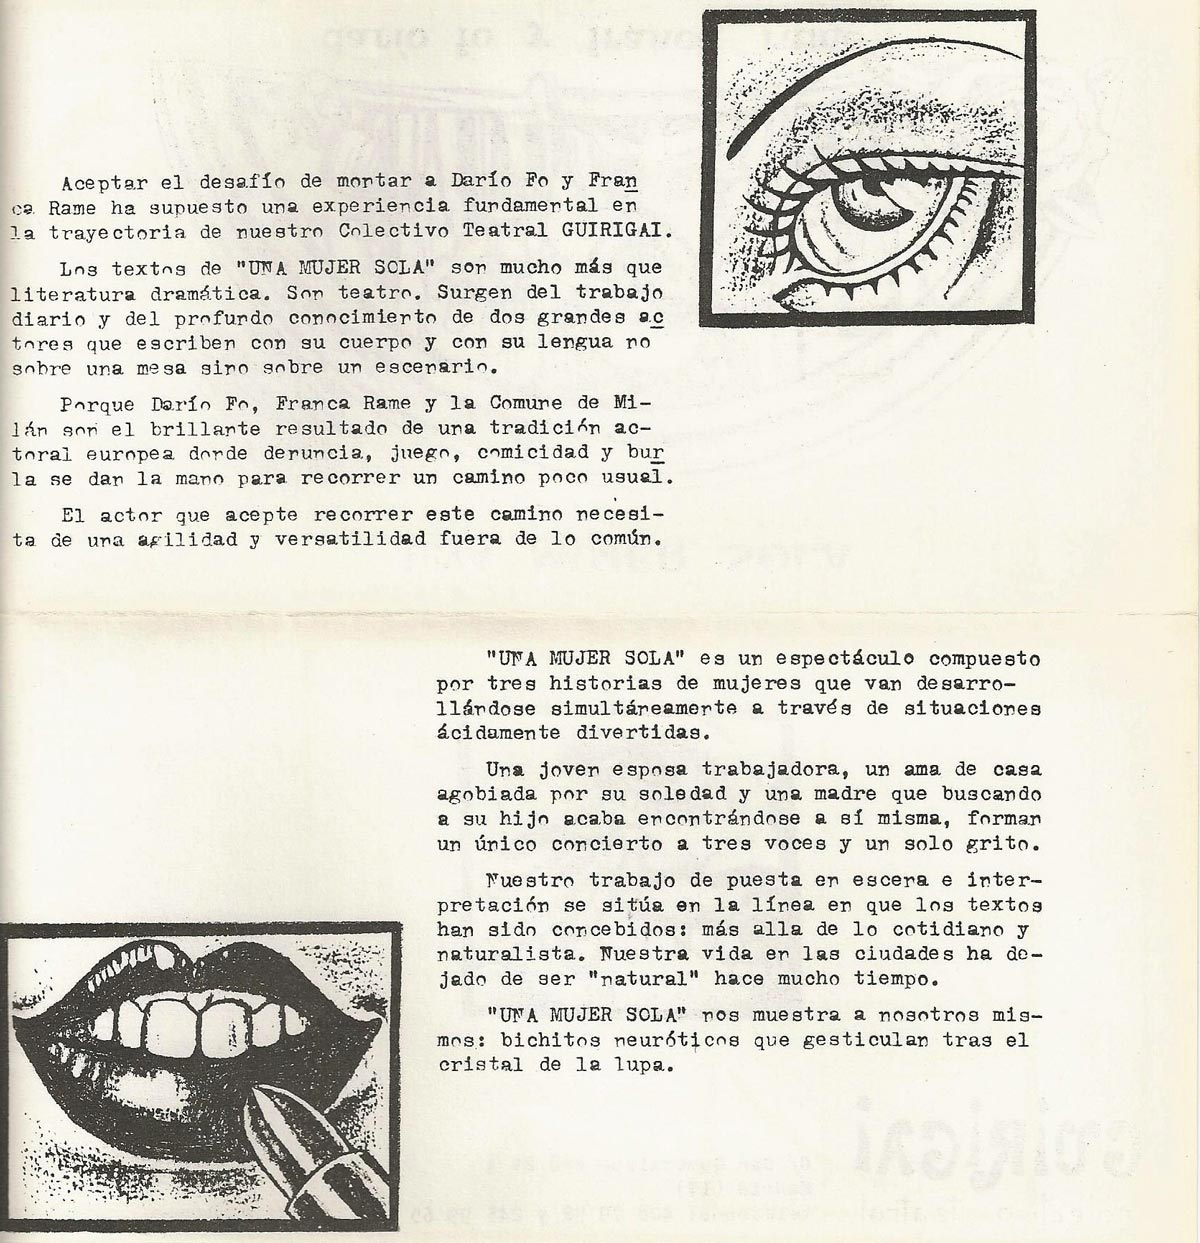 1981-Una-mujer-sola-guirigai-cartel-04